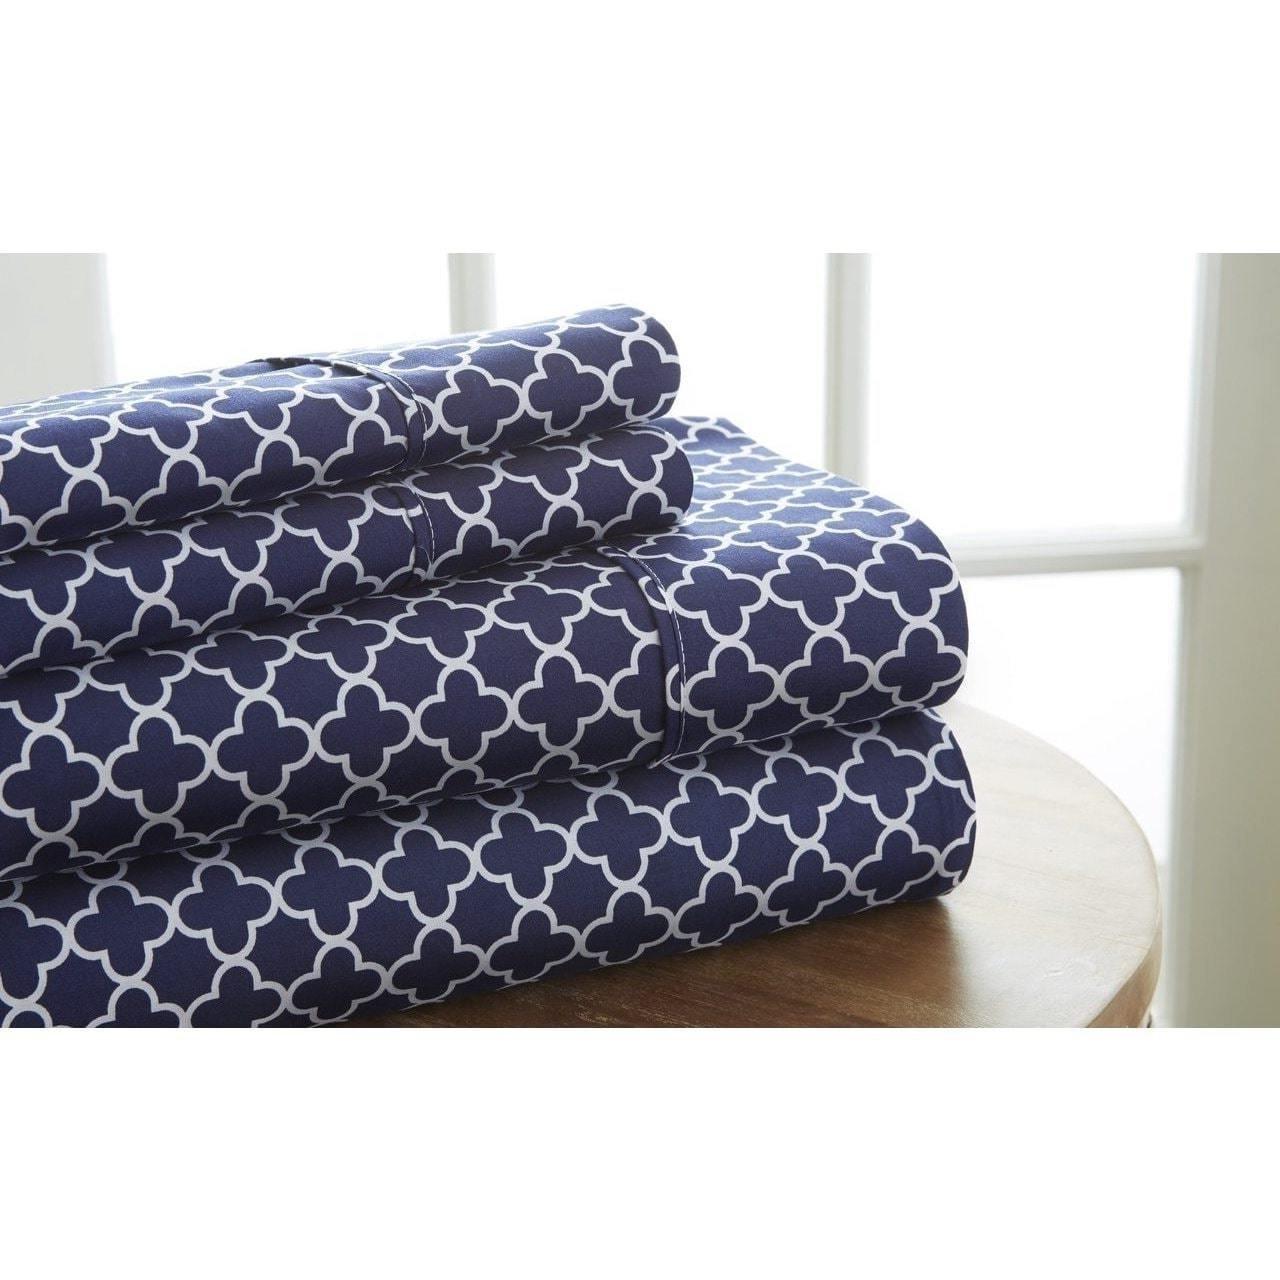 Du 4pc Girls Navy Blue Quatrefoil Queen Sheet Set, Microfiber Polyester, Deep Blue White Color Lattice Trellis Pattern Deep Pocket Design, Kids Bedding Modern Traditional Geometric Themed Teen